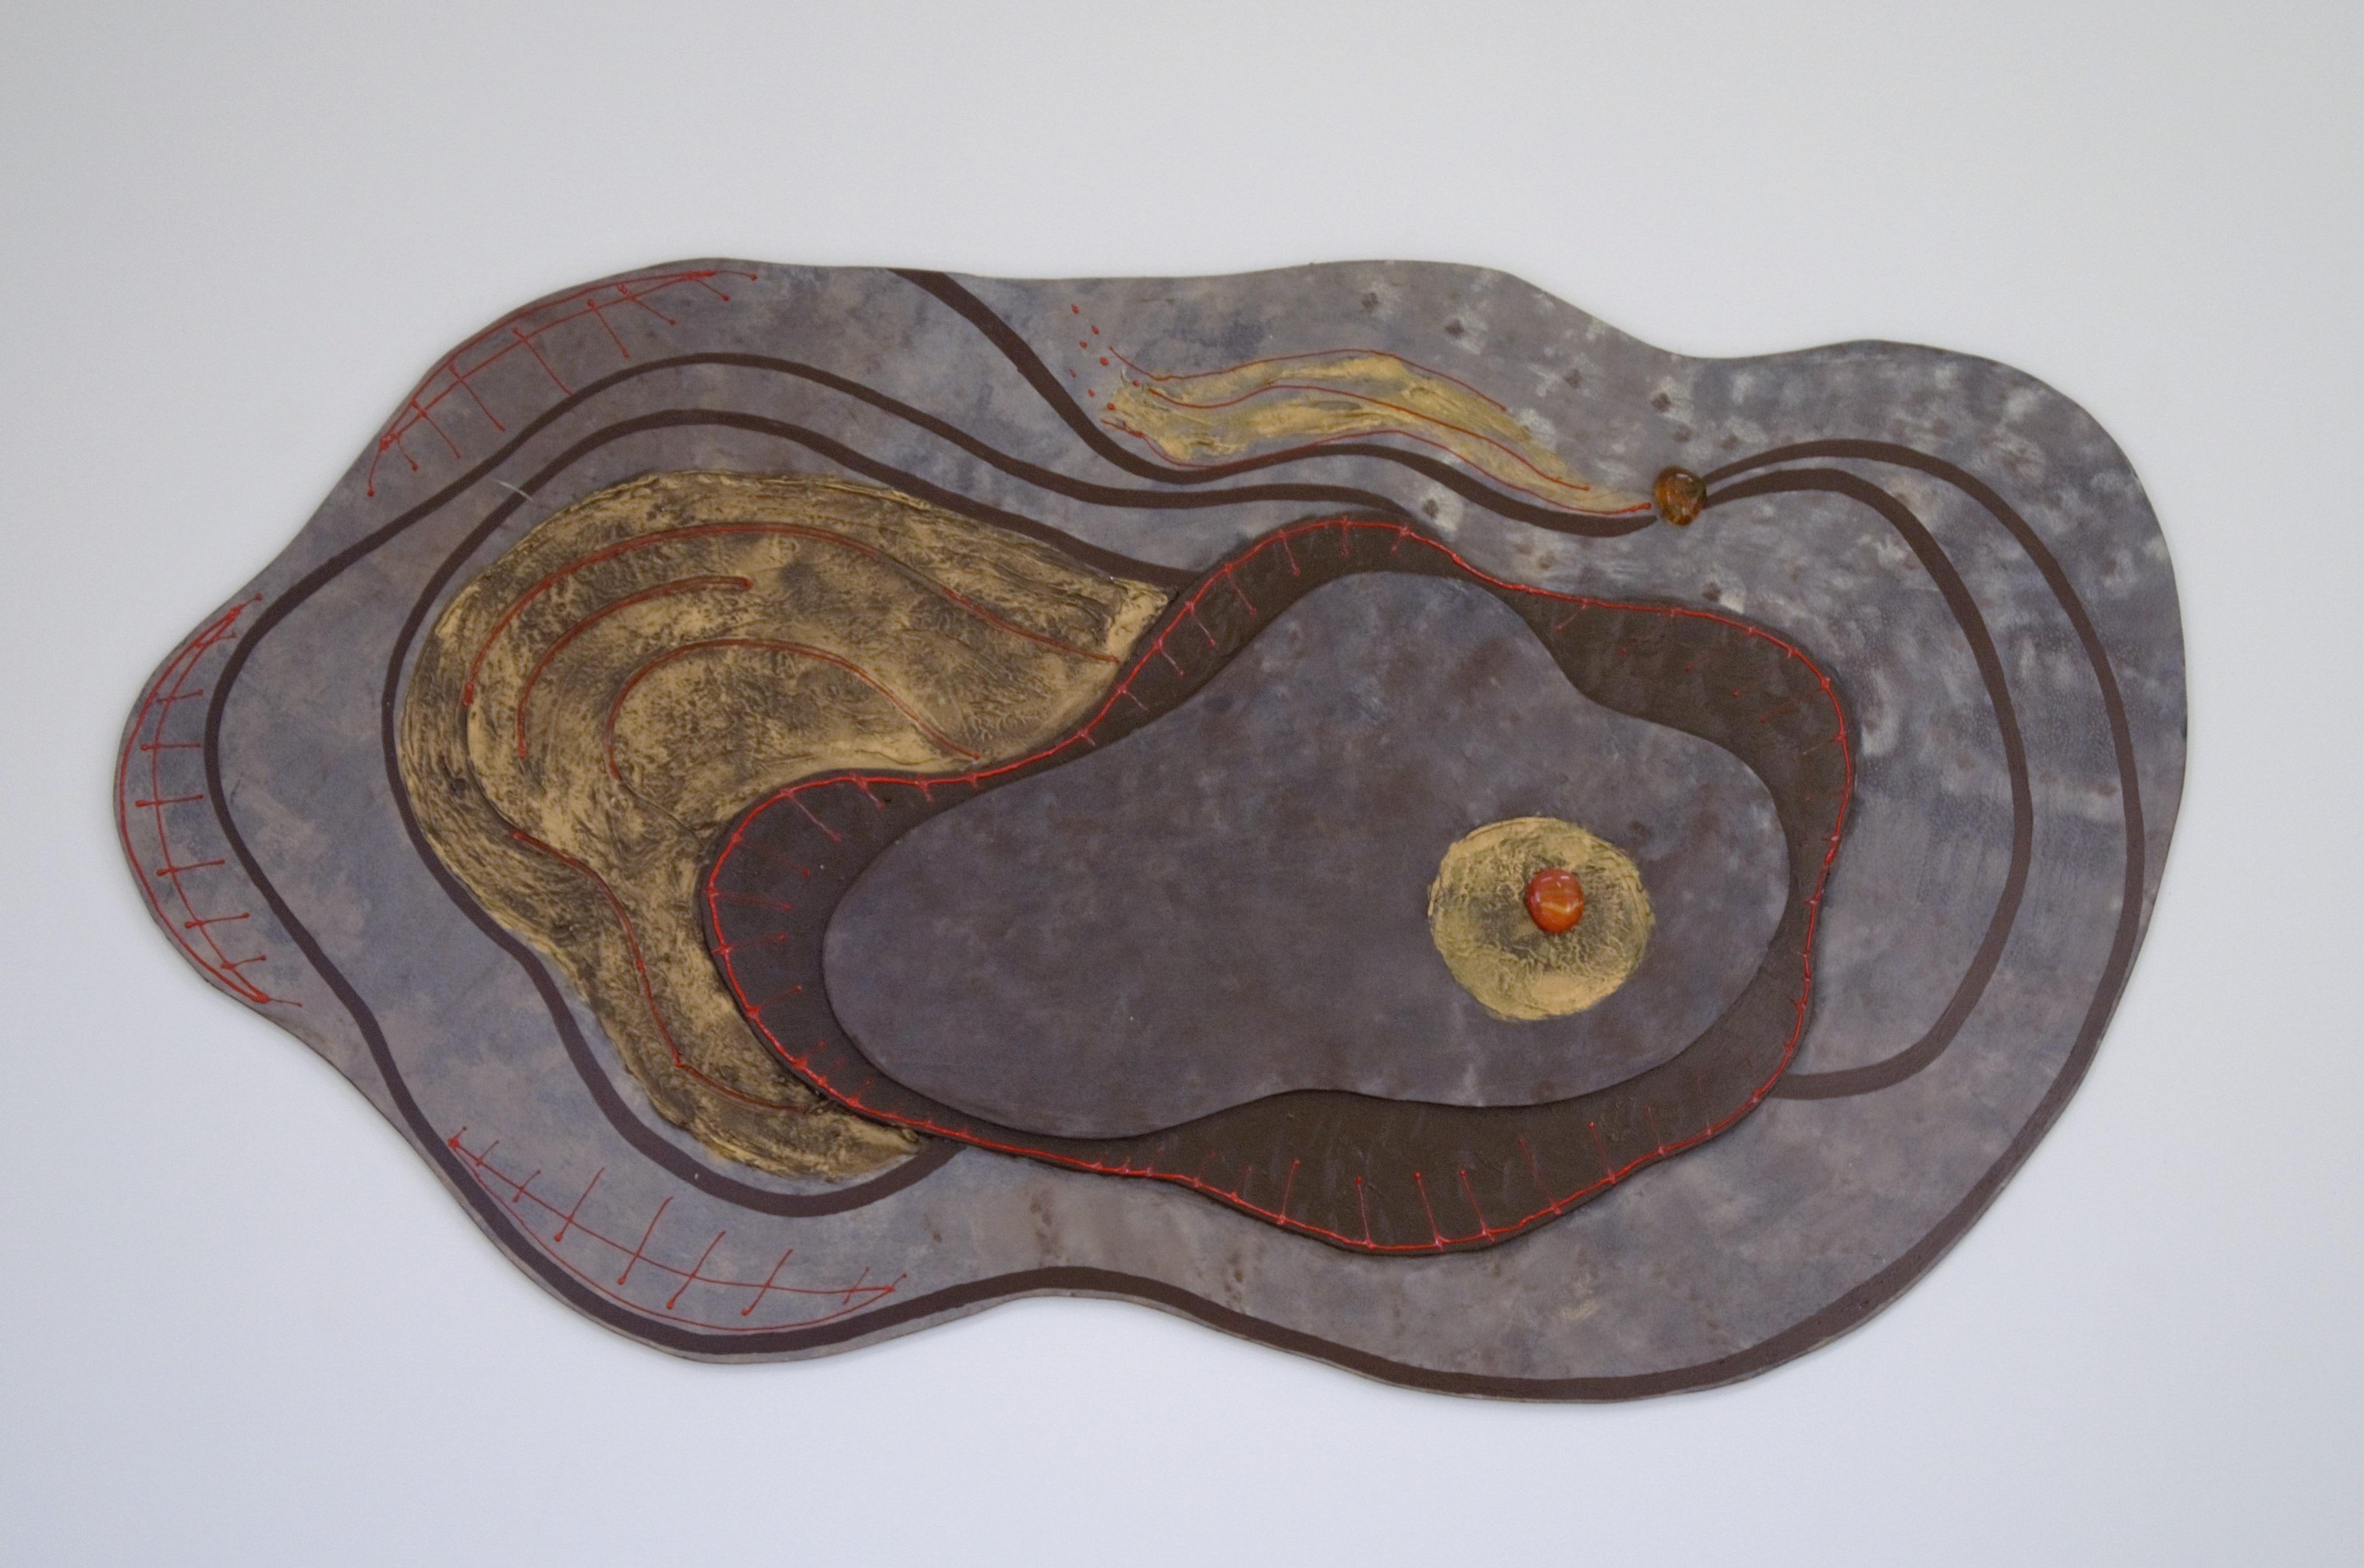 Gambar Abstrak Kayu Dekorasi Geometris Keramik Bahan